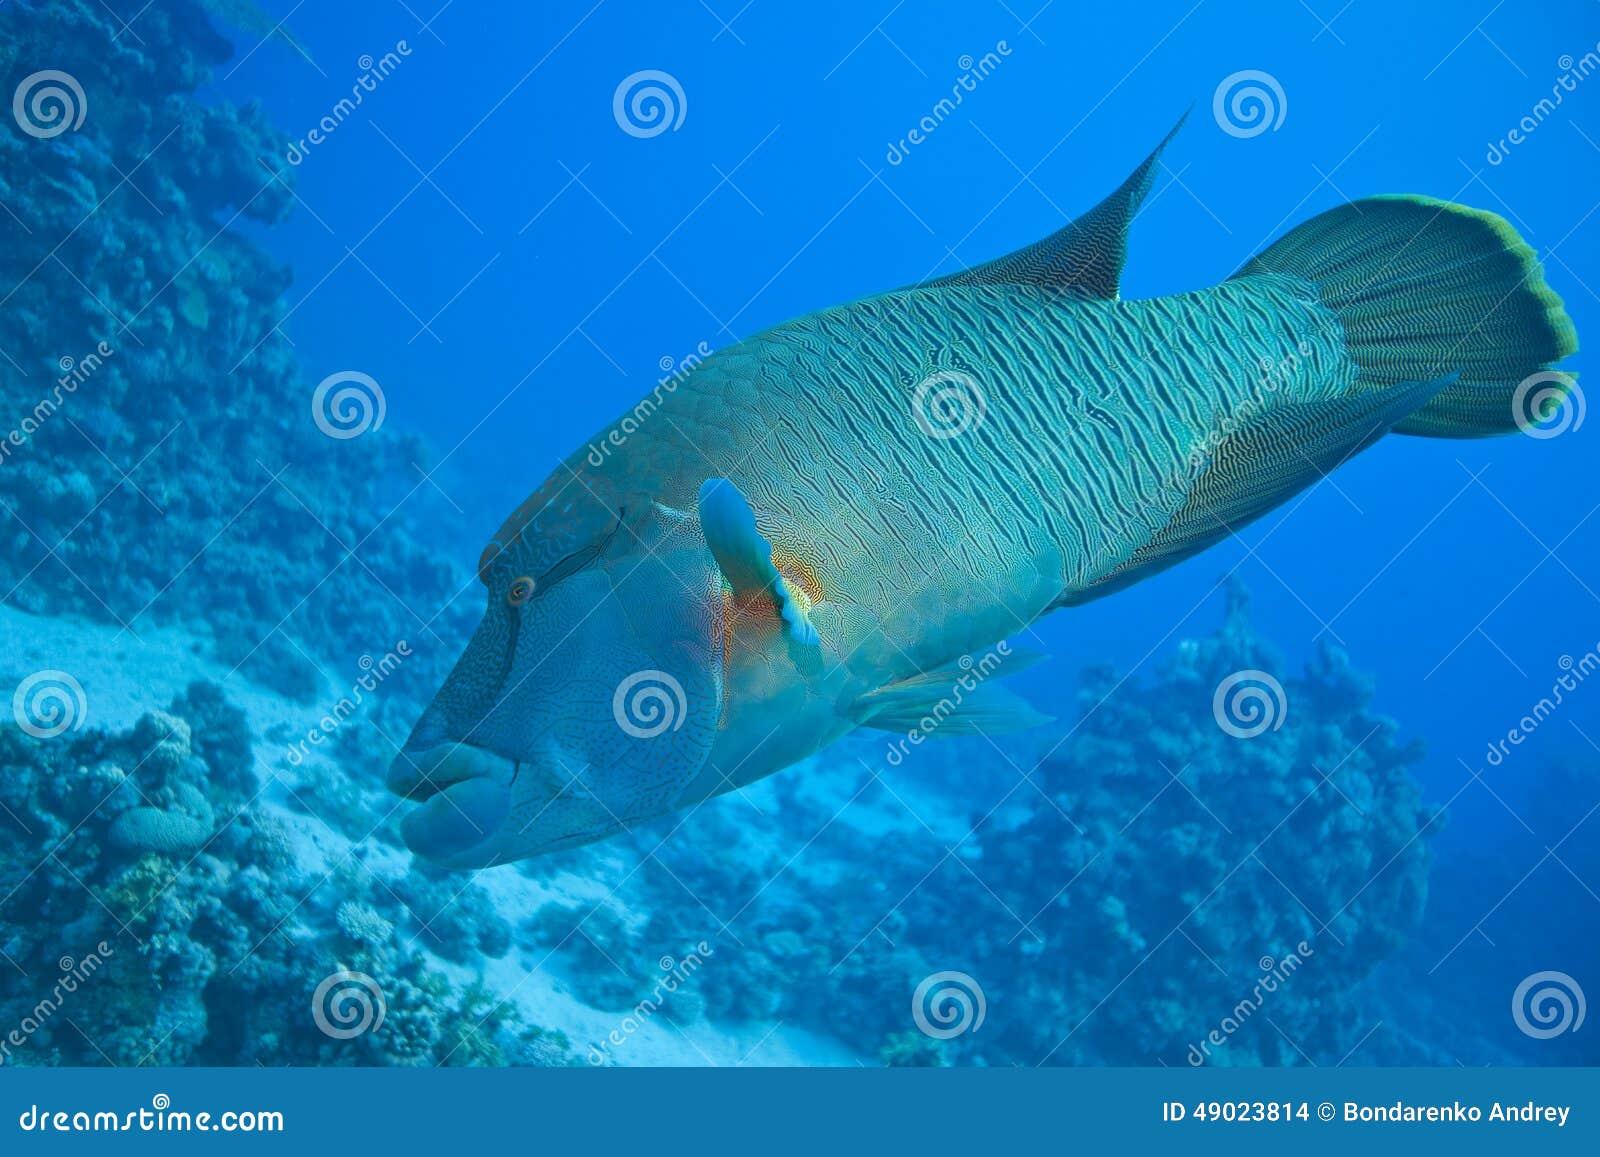 Napoleon fish stock photo image 49023814 for Red sea fish